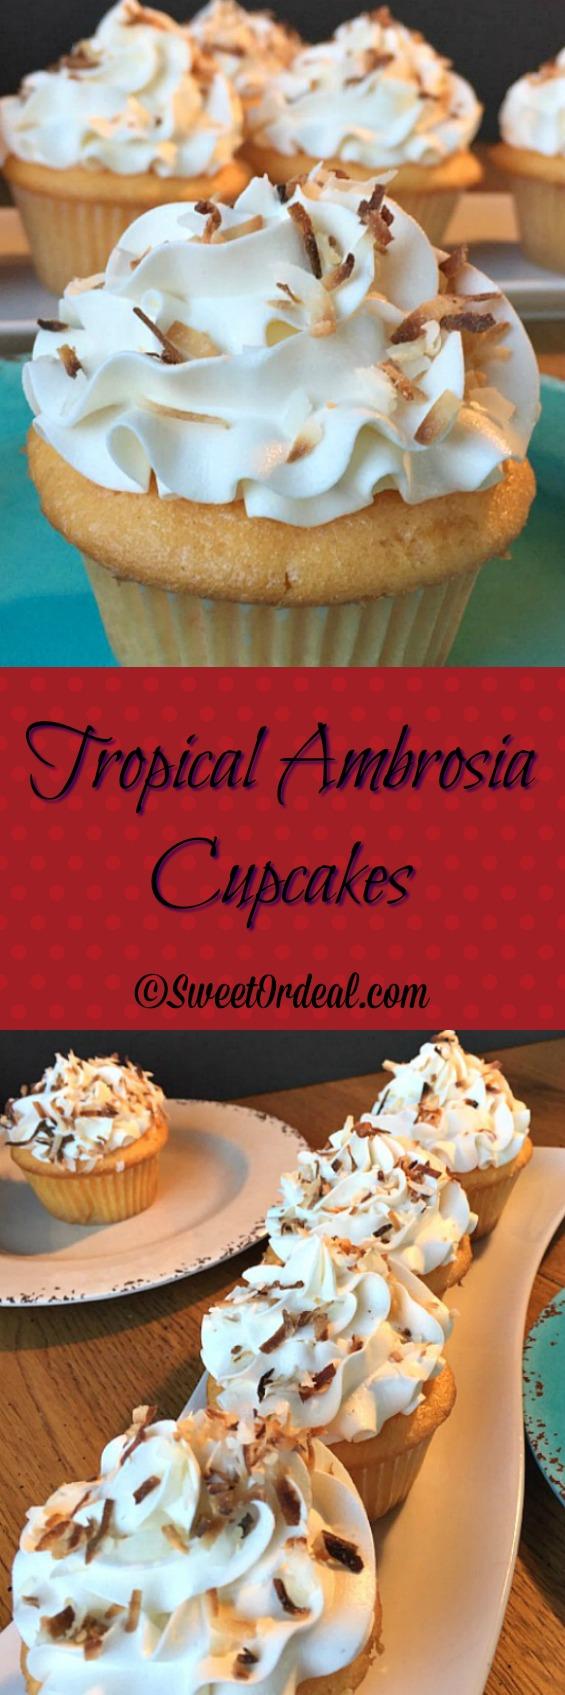 Tropical Ambrosia Cupcakes